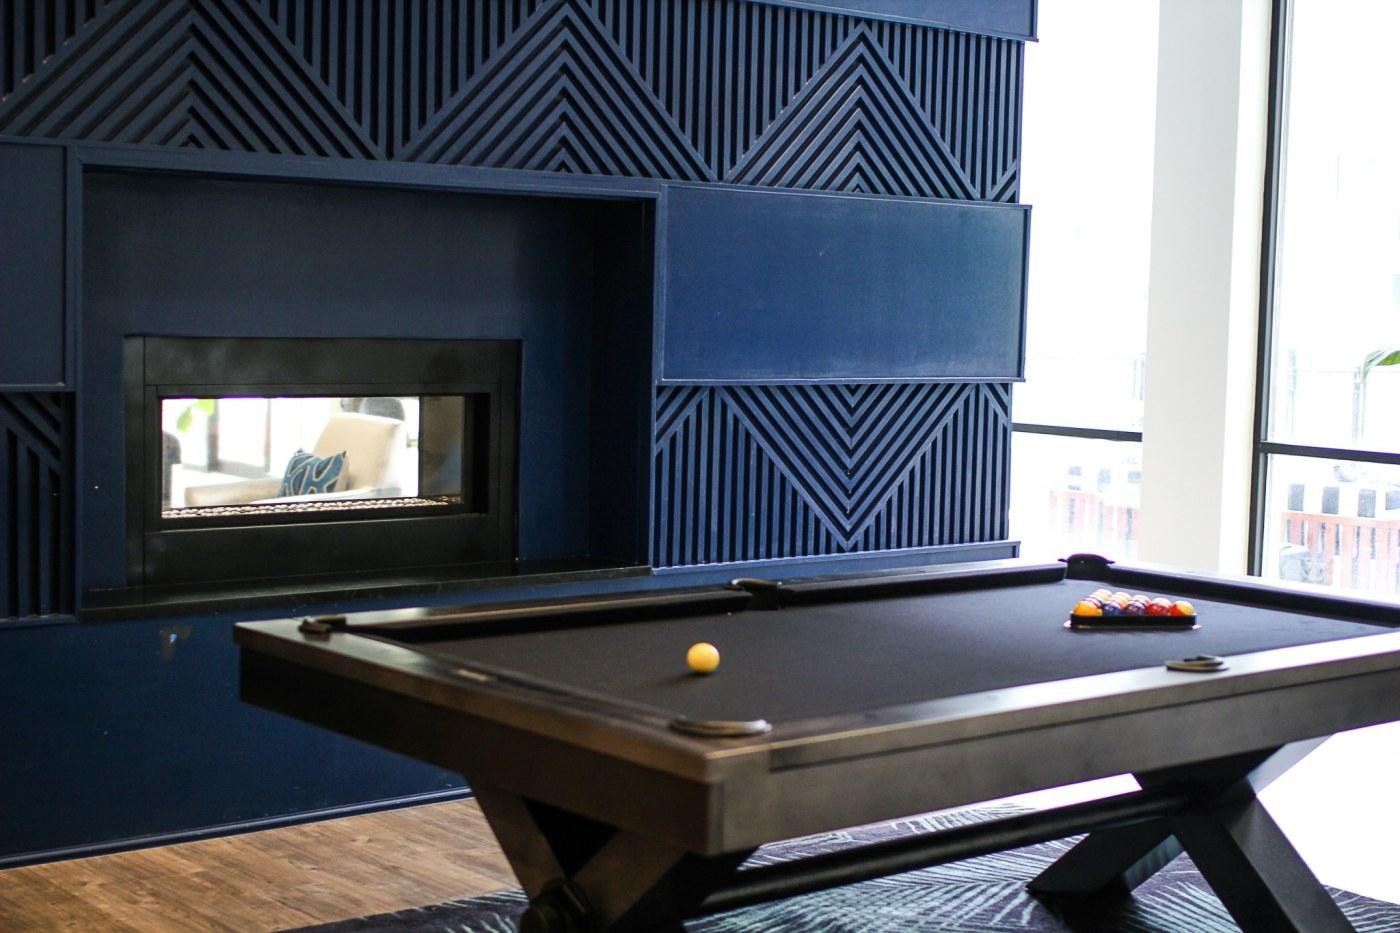 Birmingham, Alabama, The Metropolitan, UAB medical student housing options, billiards